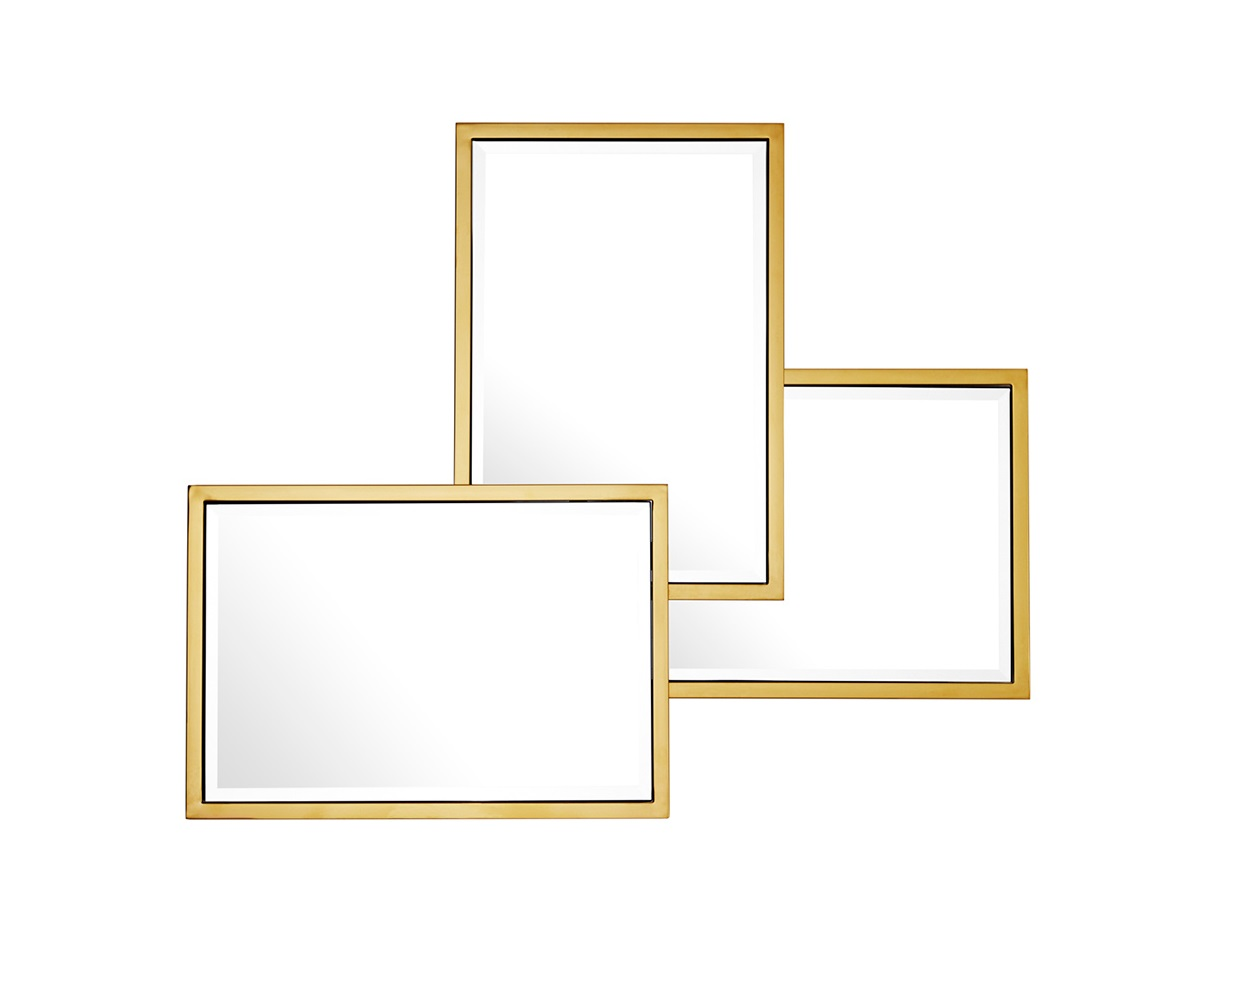 ЗеркалоНастенные зеркала<br>Зеркало Mirror Sensation с имитацией 3-х зеркал в рамках золотого цвета.<br><br>Material: Стекло<br>Width см: 80<br>Height см: 96